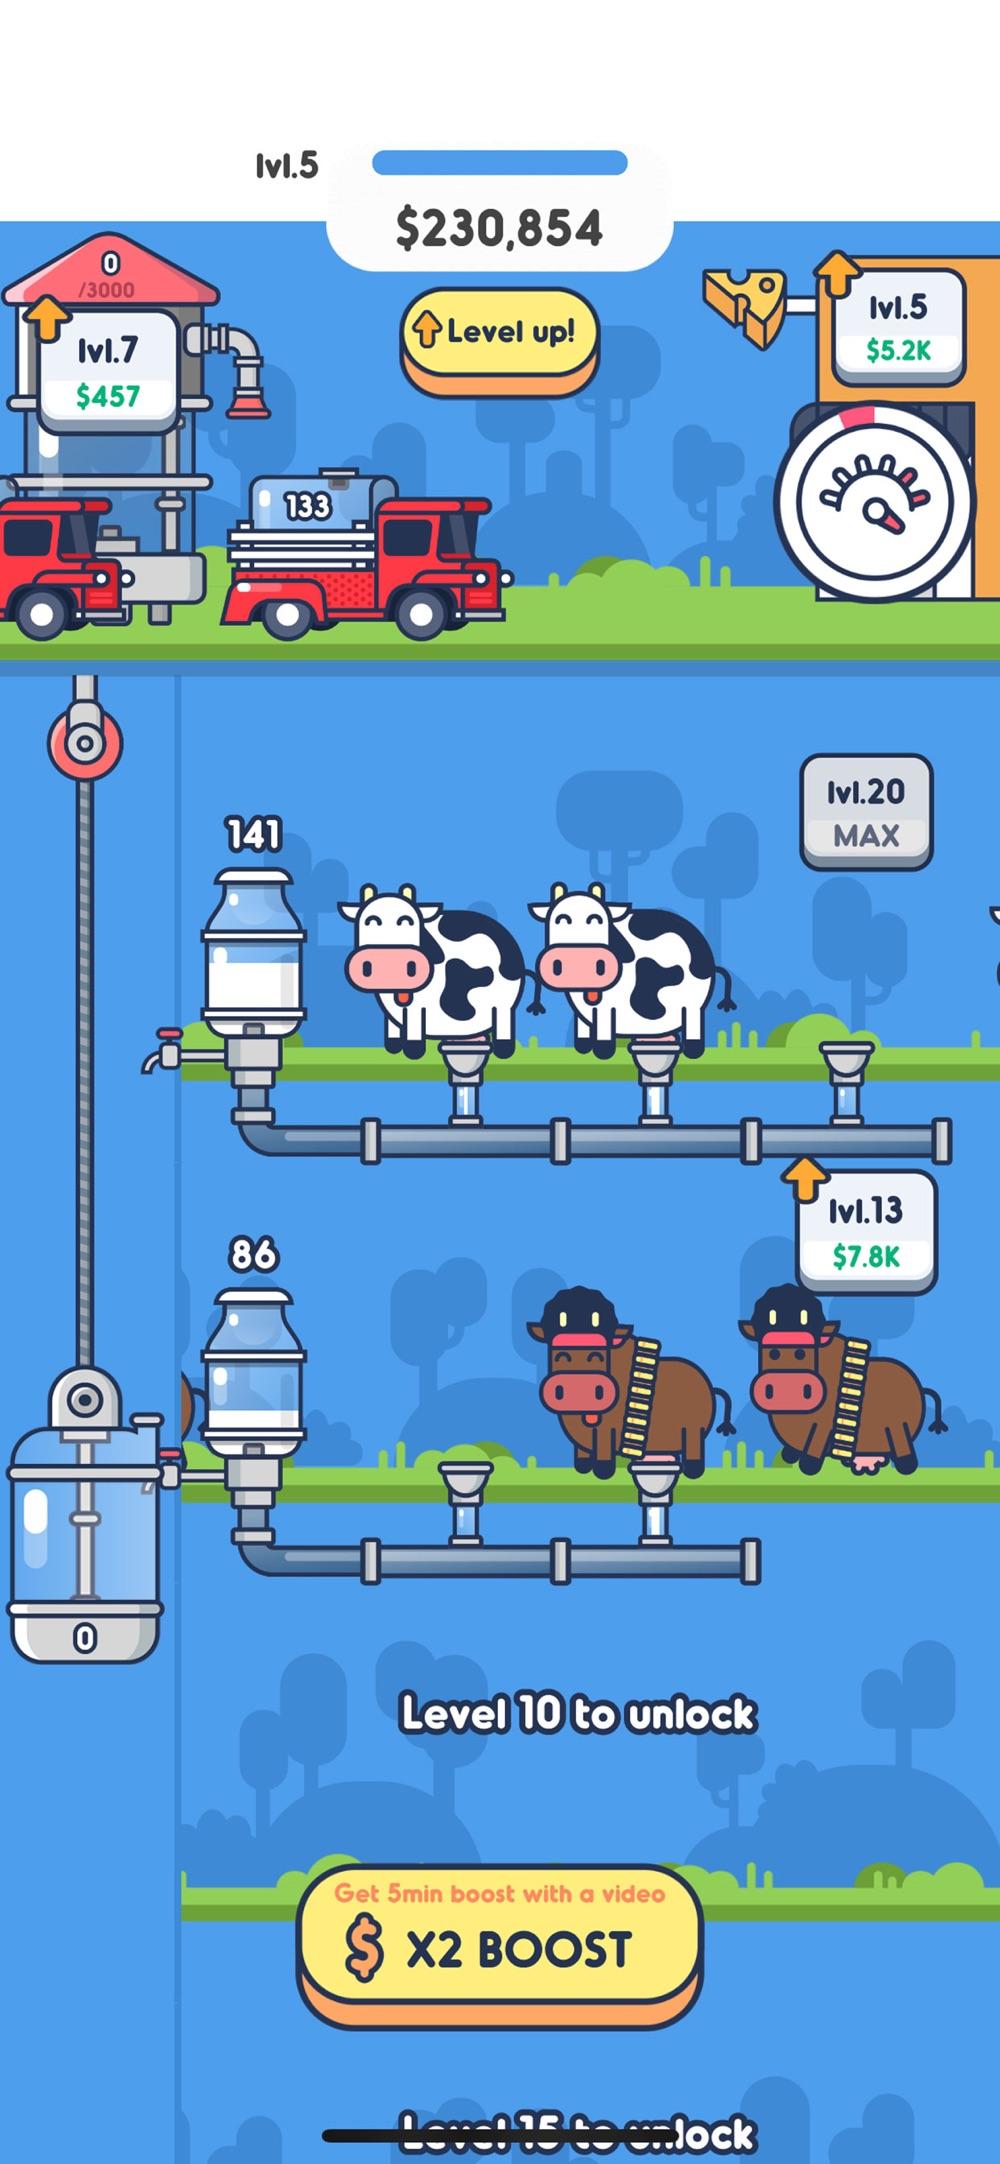 Milk Factory Cheat Codes